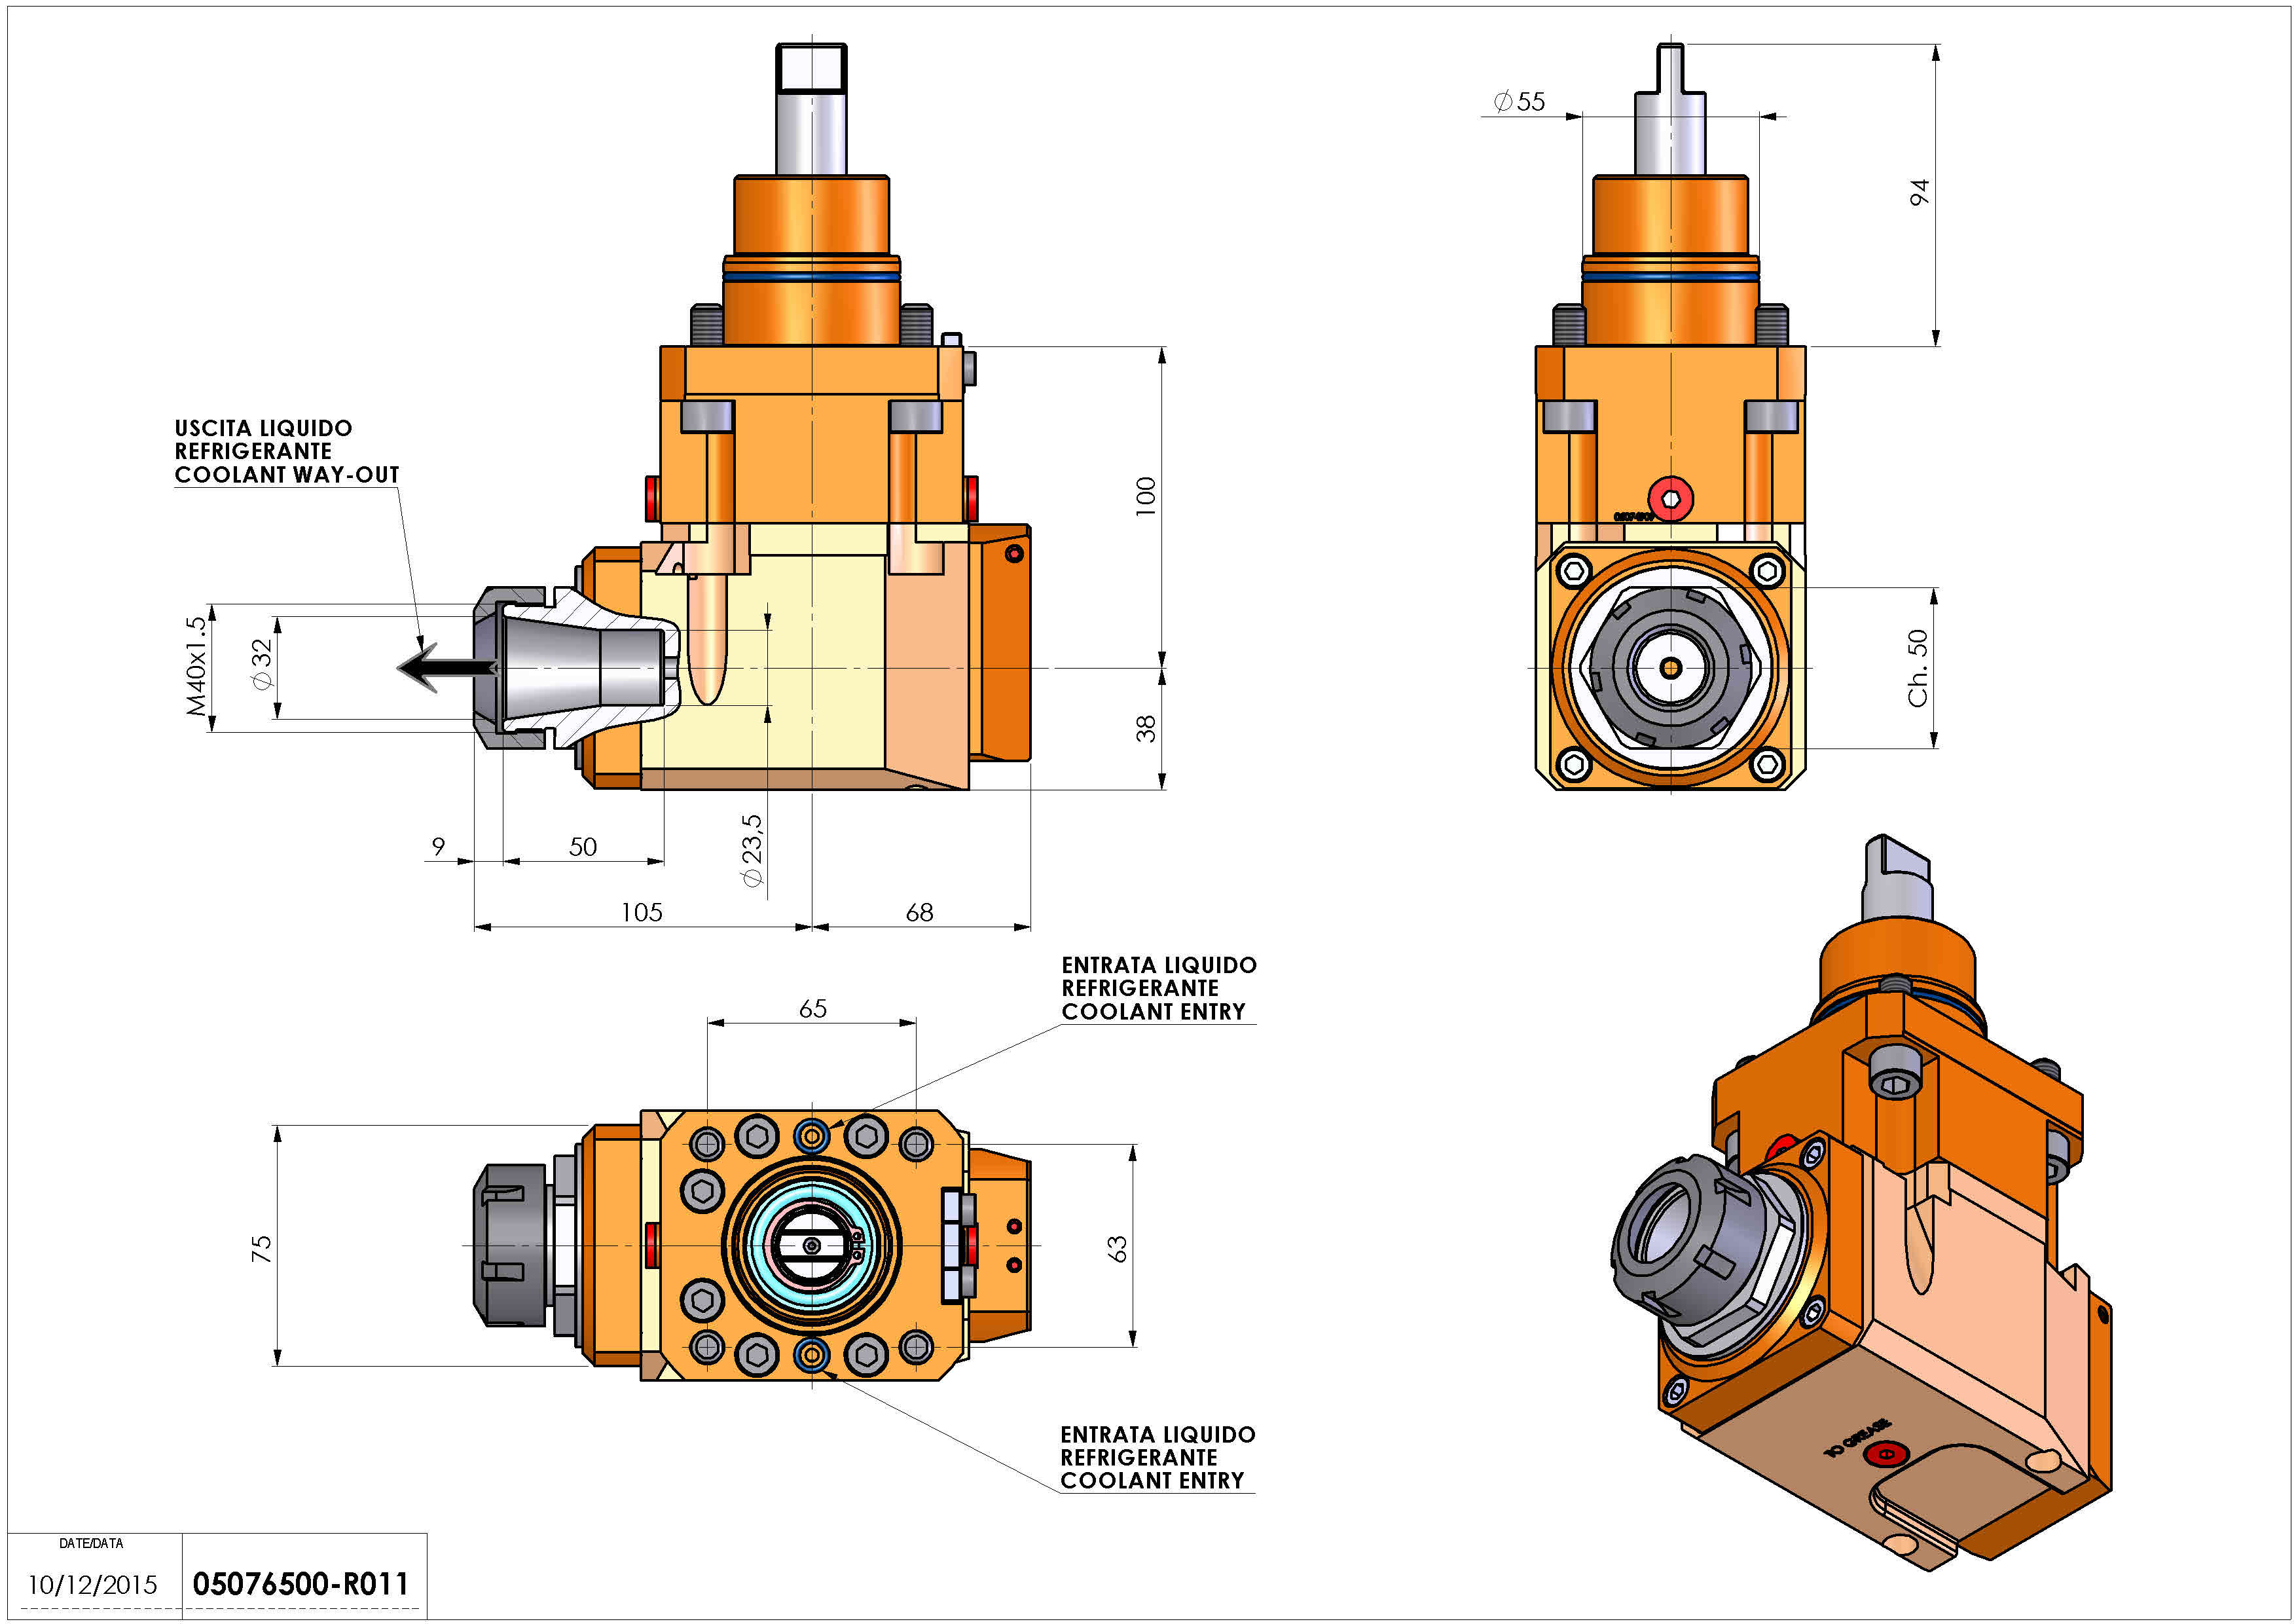 Technical image - LT-A D55 ER32 LR RF 2:1 H100BI.